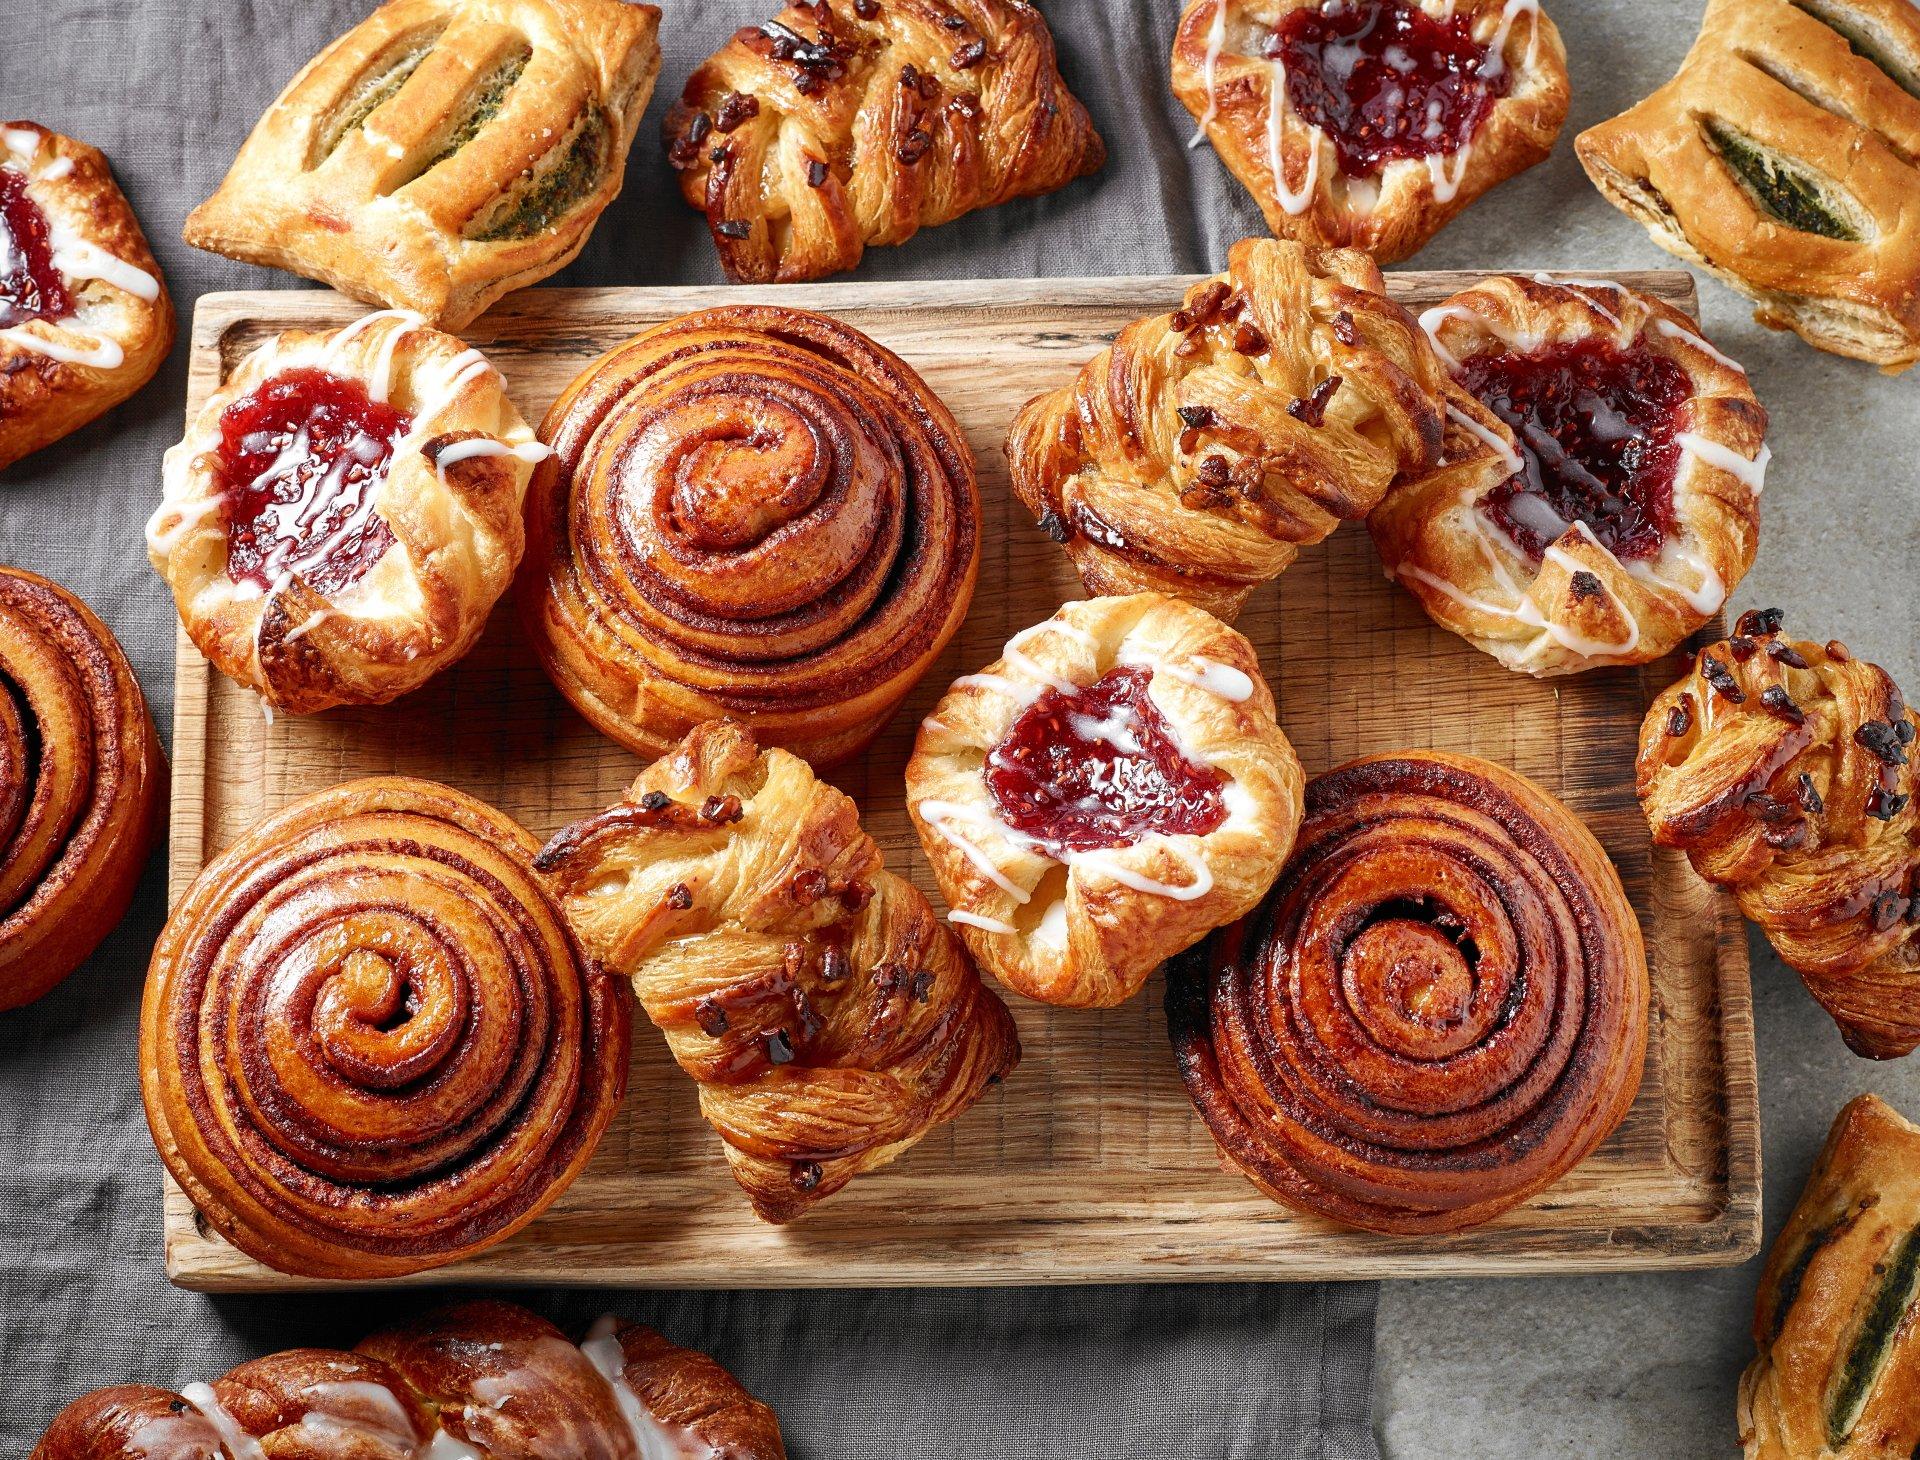 Food - Breakfast  Pastry Wallpaper